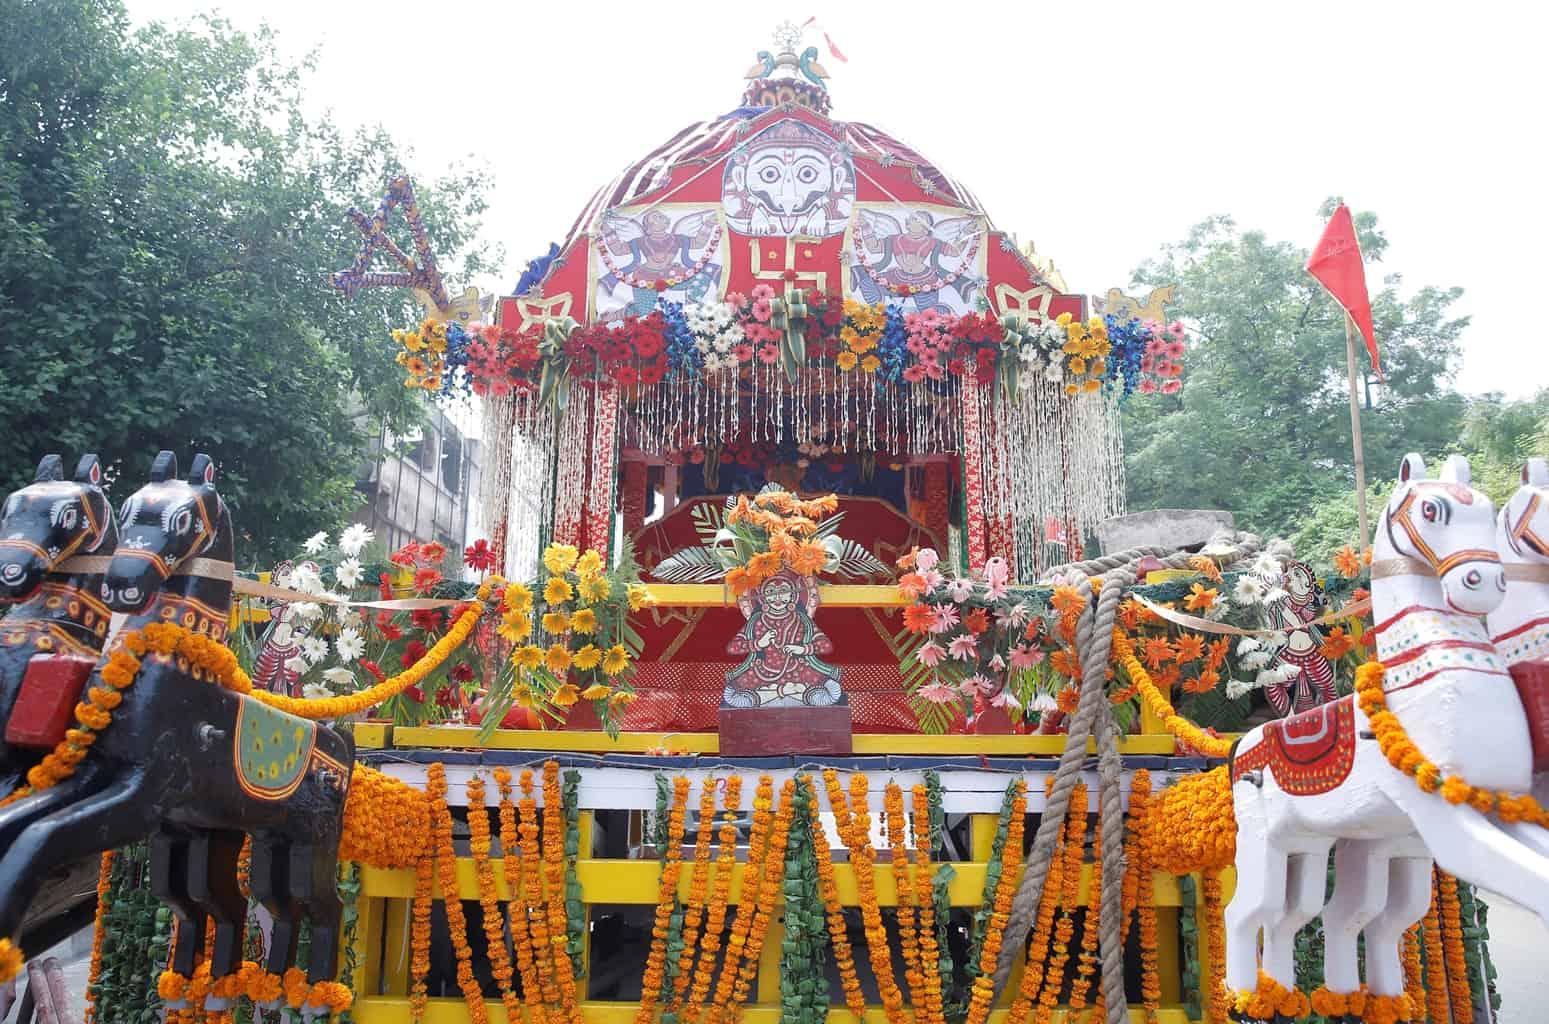 जगन्नाथ पुरी रथ यात्रा महोत्सव - Jagannath Puri Rath Yatra Festival